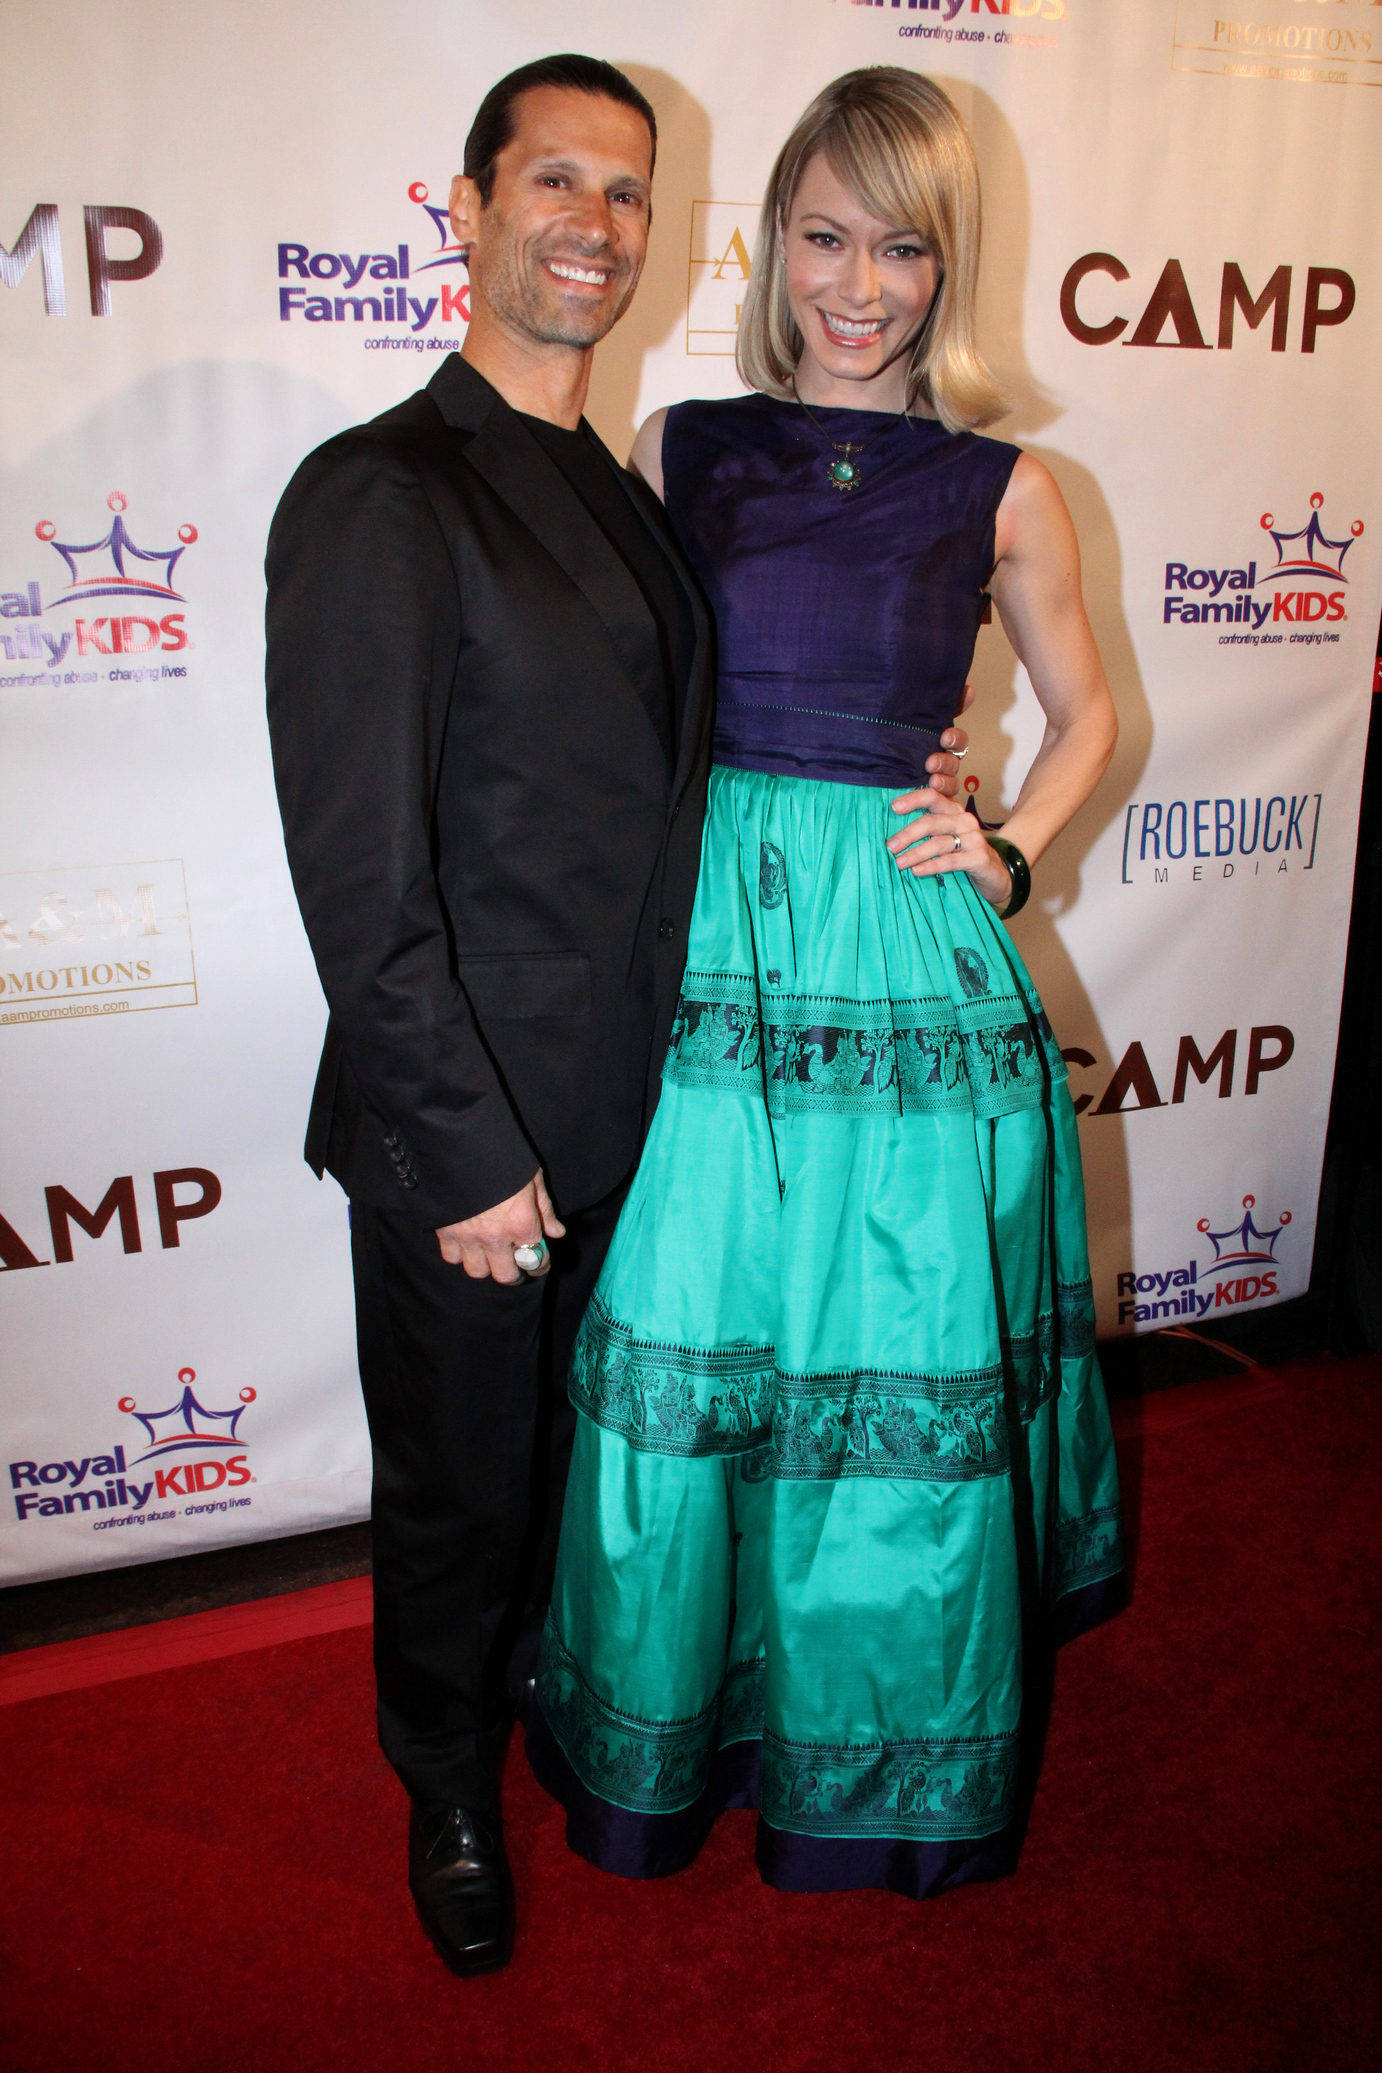 Rich Tola and Stephanie Drapeau at CAMP movie premiere 2/22 (photo by Bob Delgadillo)